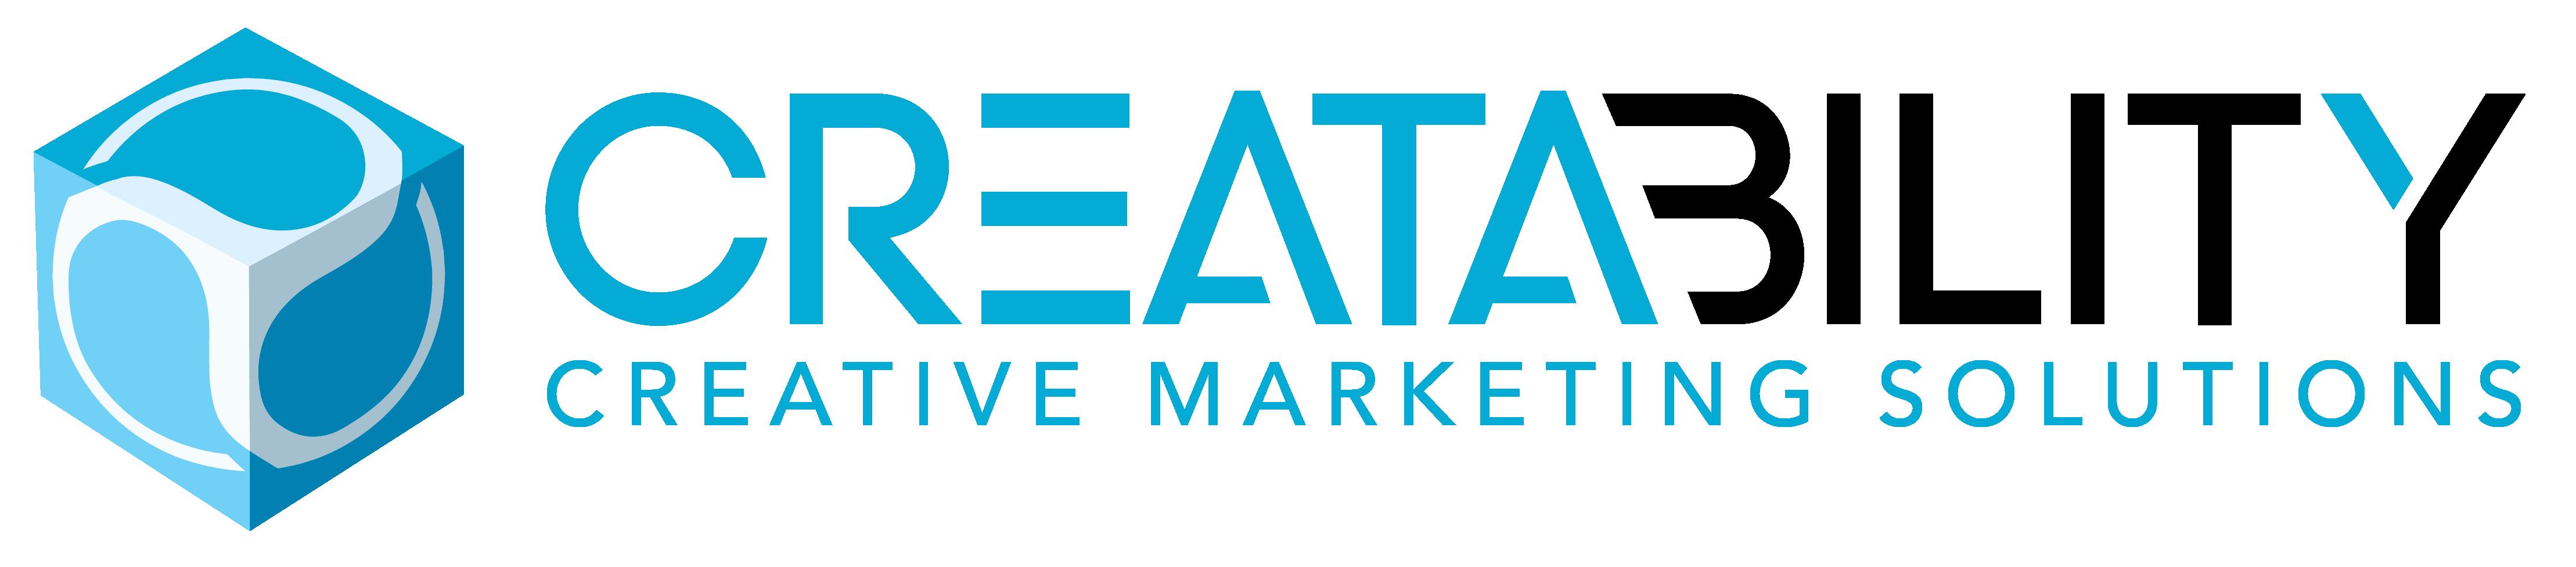 Creatability Logo blue and black2017